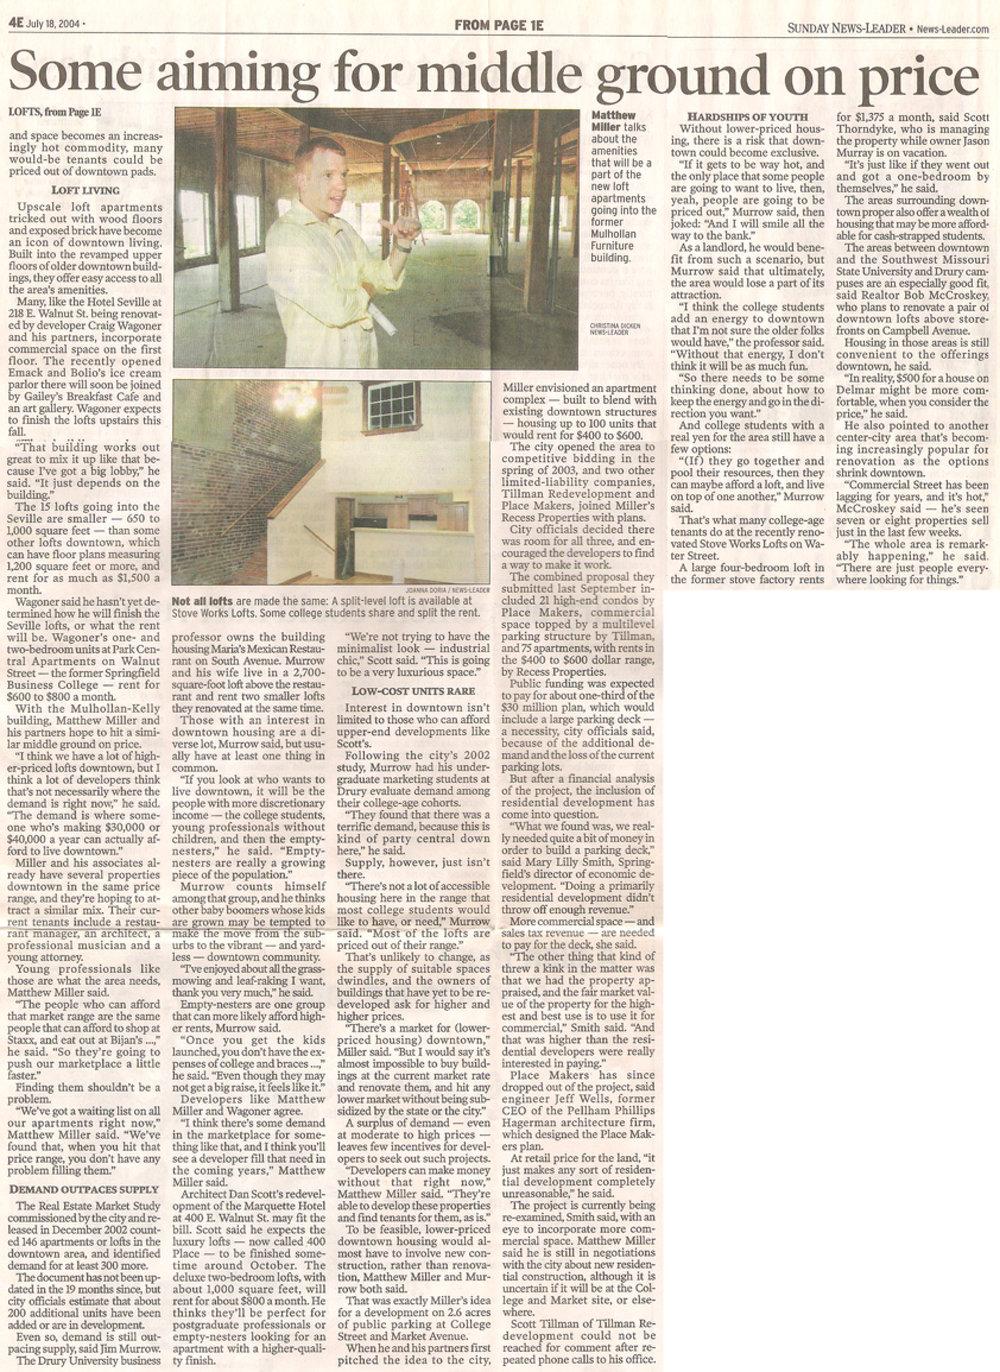 2004-07-18 - Founders Park Lofts - Springfield News-Leader-2.jpg